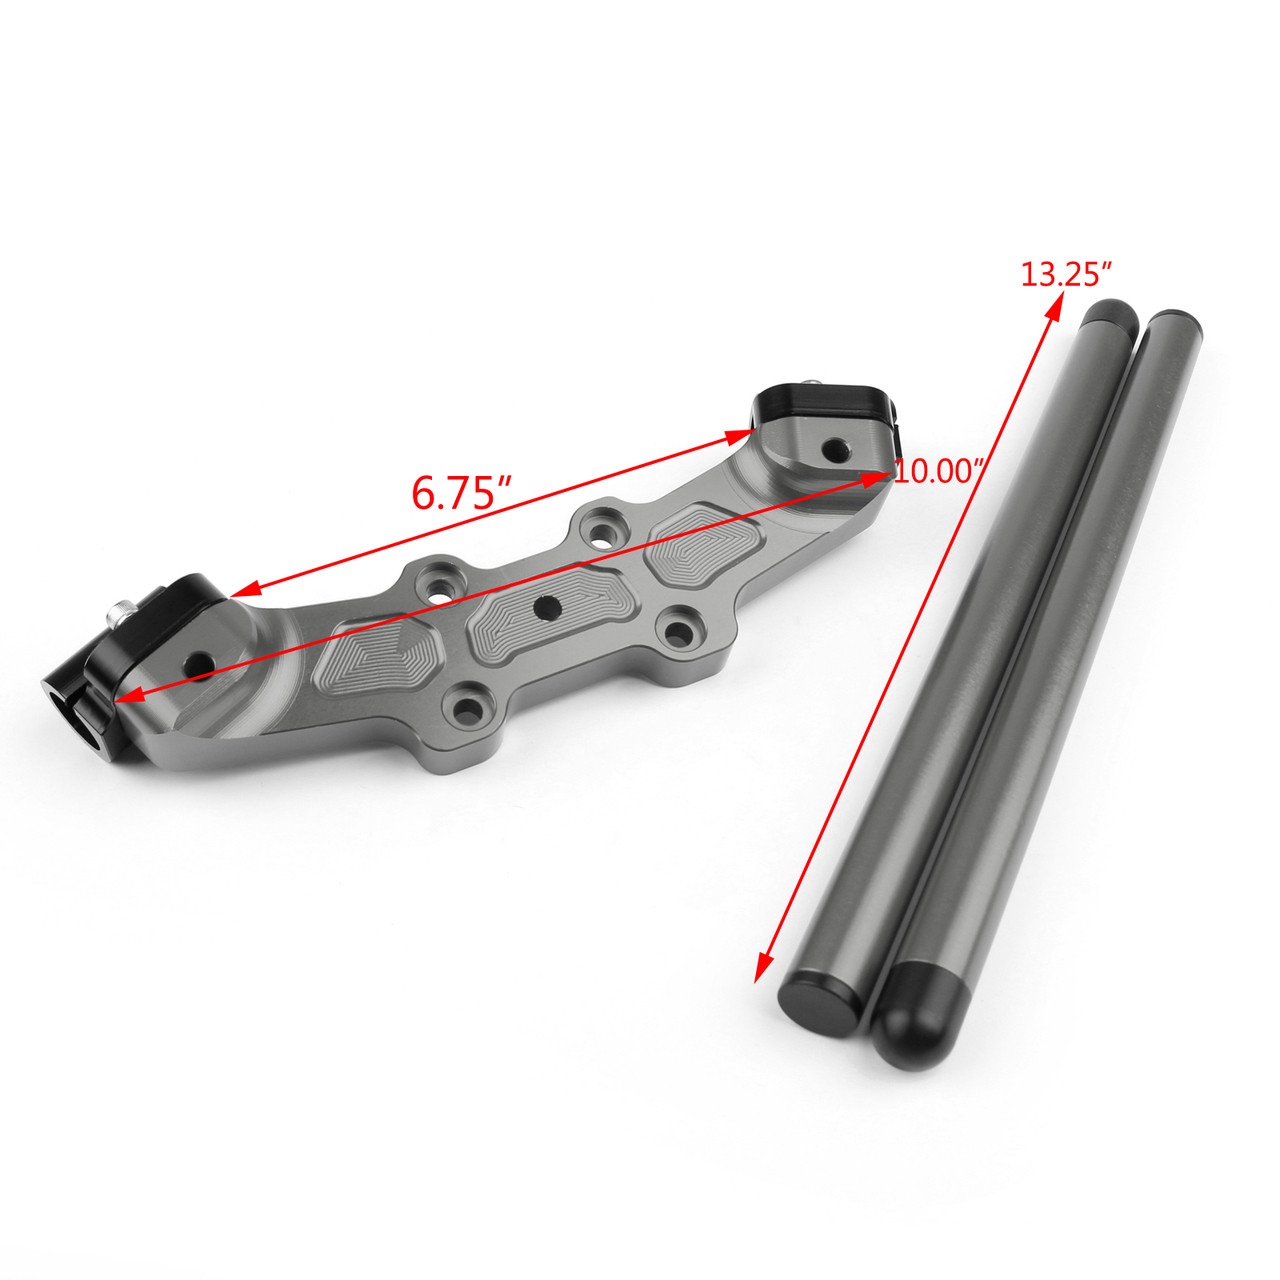 http://www.madhornets.store/AMZ/MotoPart/Grip/Grip-594/Grip-594-Titanium-3.jpg